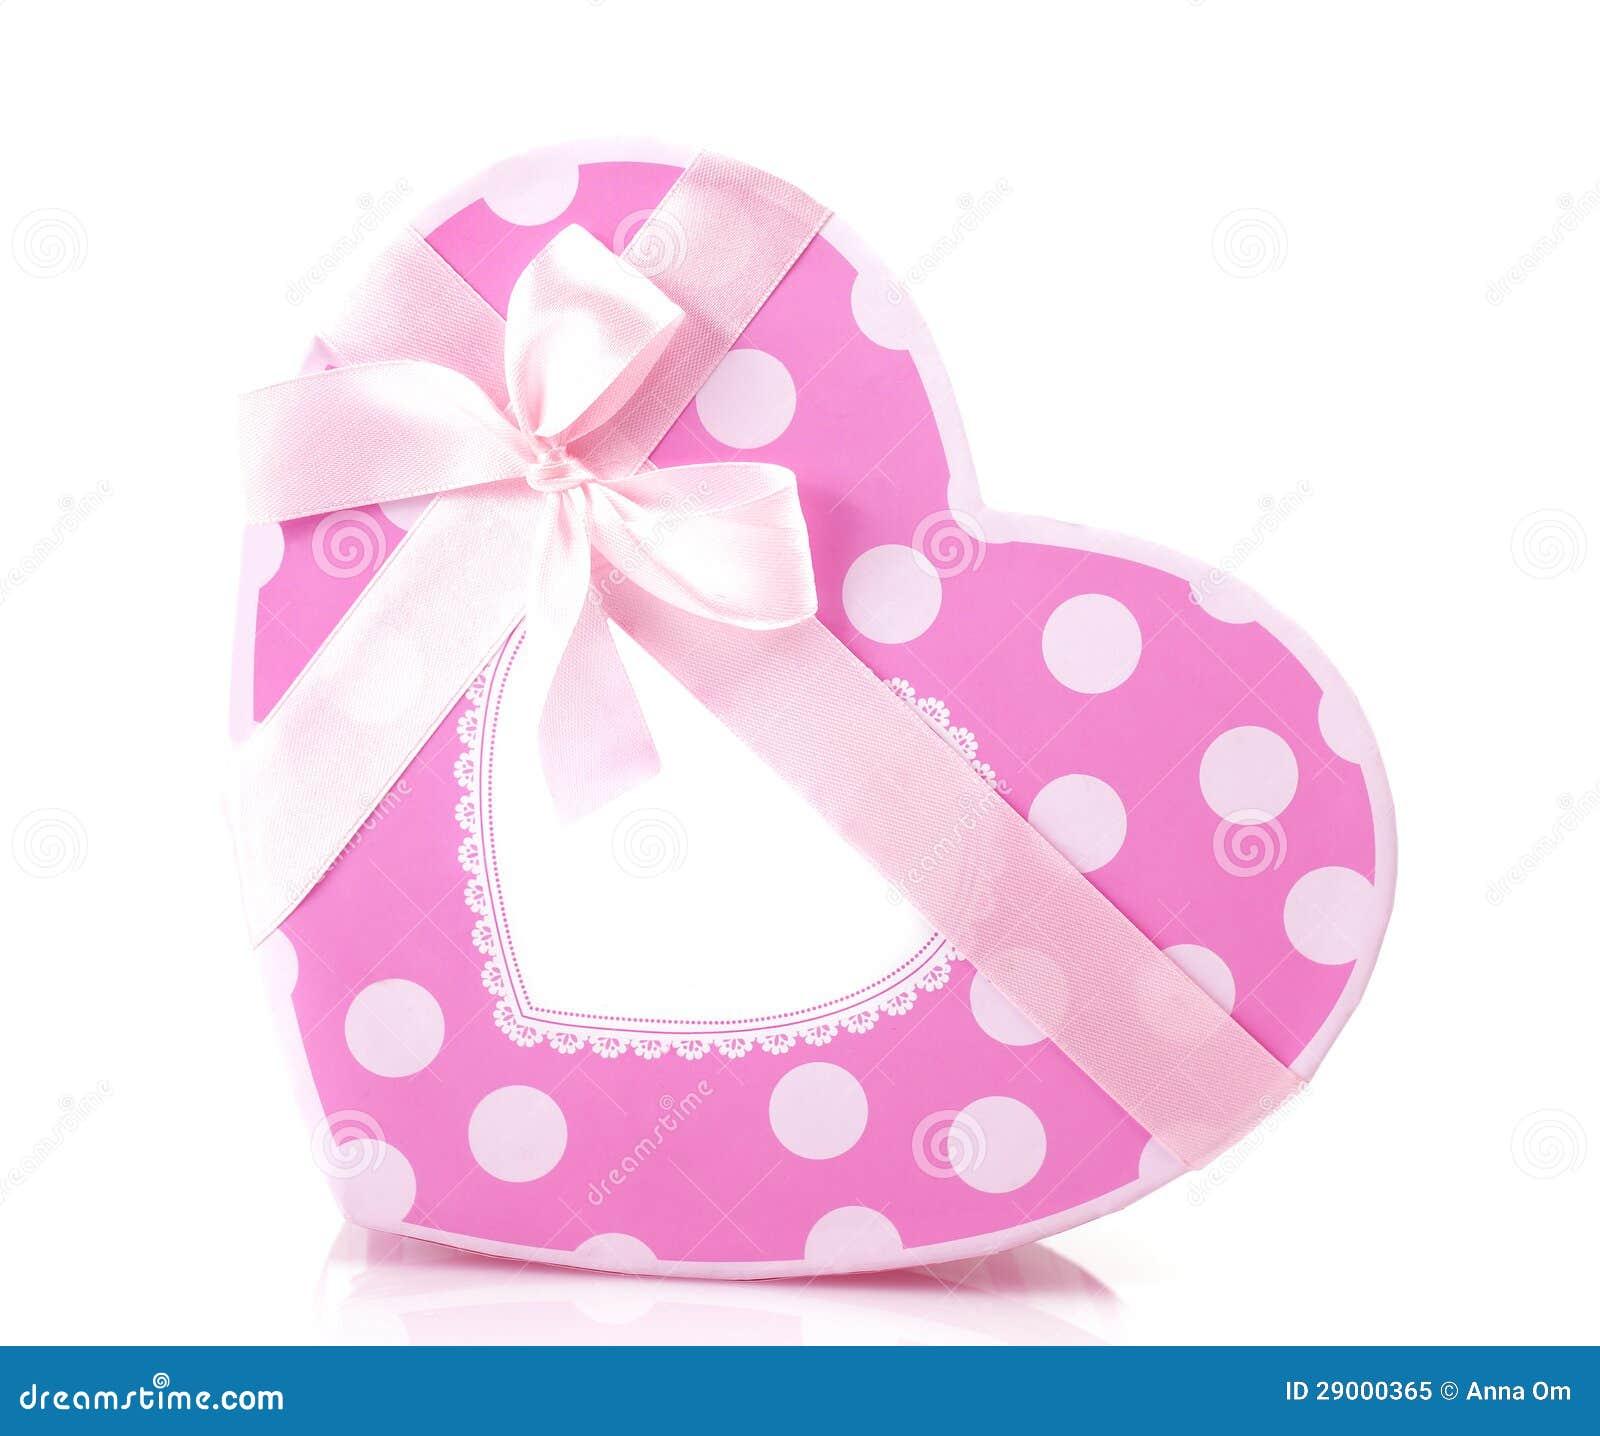 bo te cadeau en forme de coeur rose photo libre de droits image 29000365. Black Bedroom Furniture Sets. Home Design Ideas